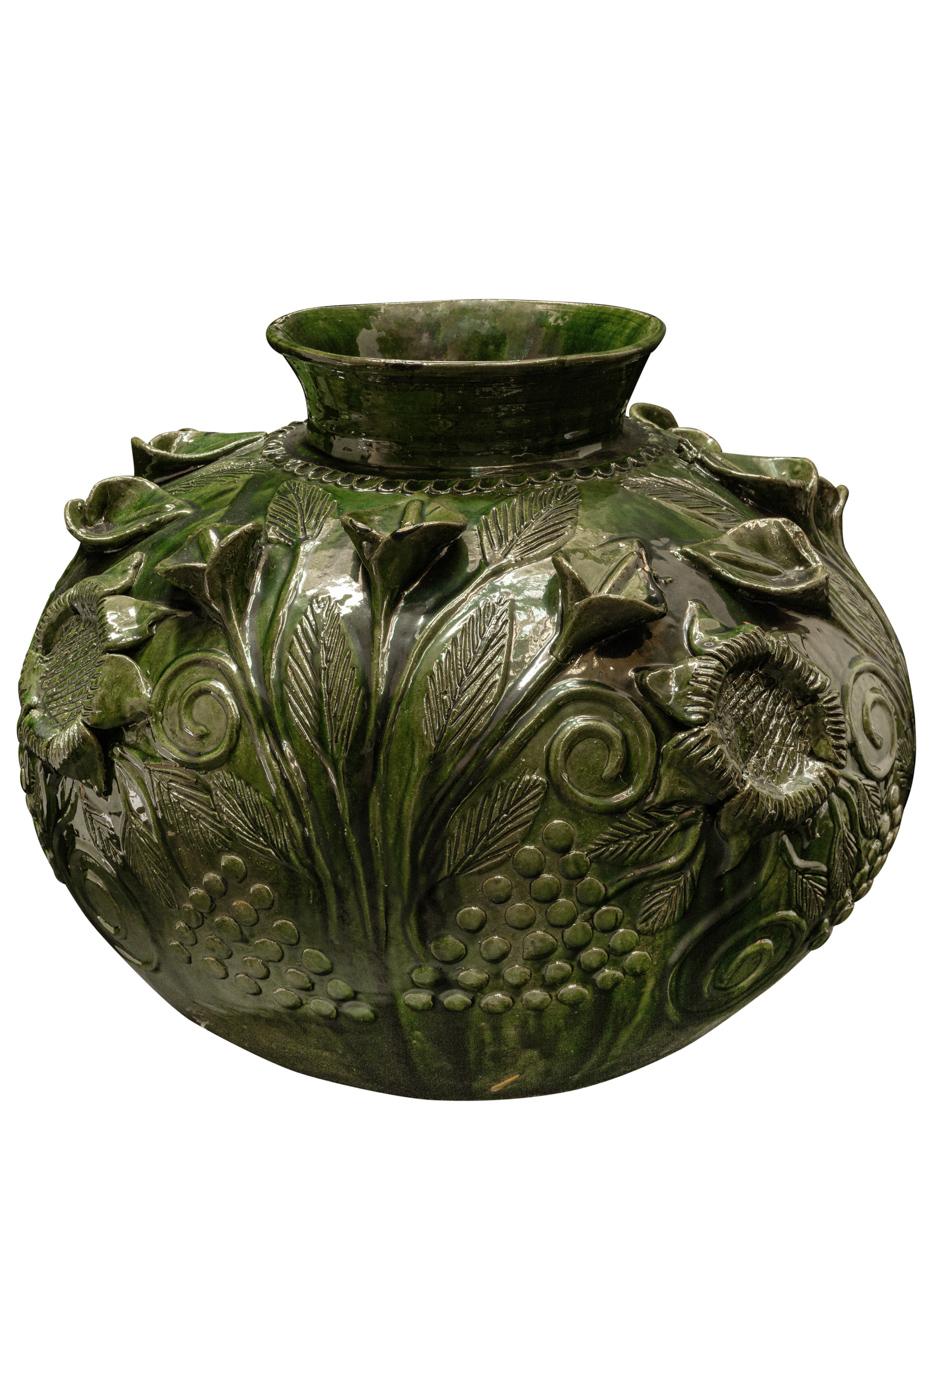 Mexican Green Ceramic Vase